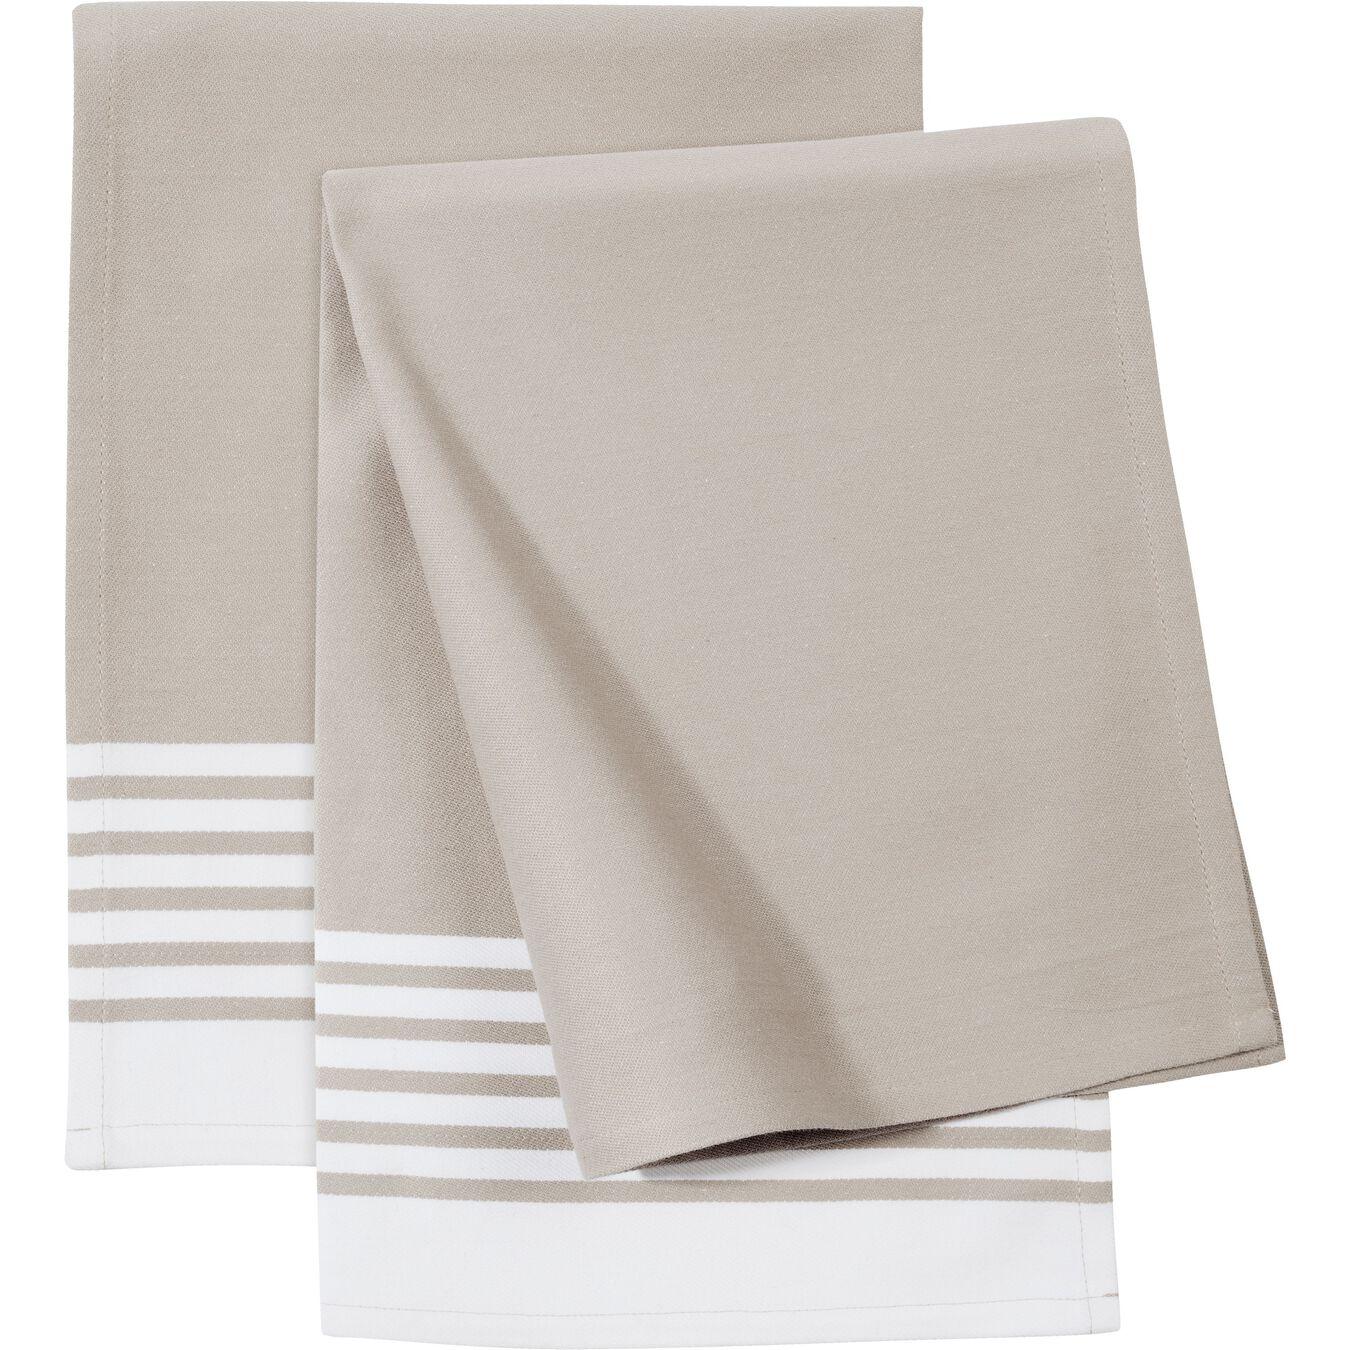 2 Piece Cotton Kitchen towel set striped, Taupe,,large 1